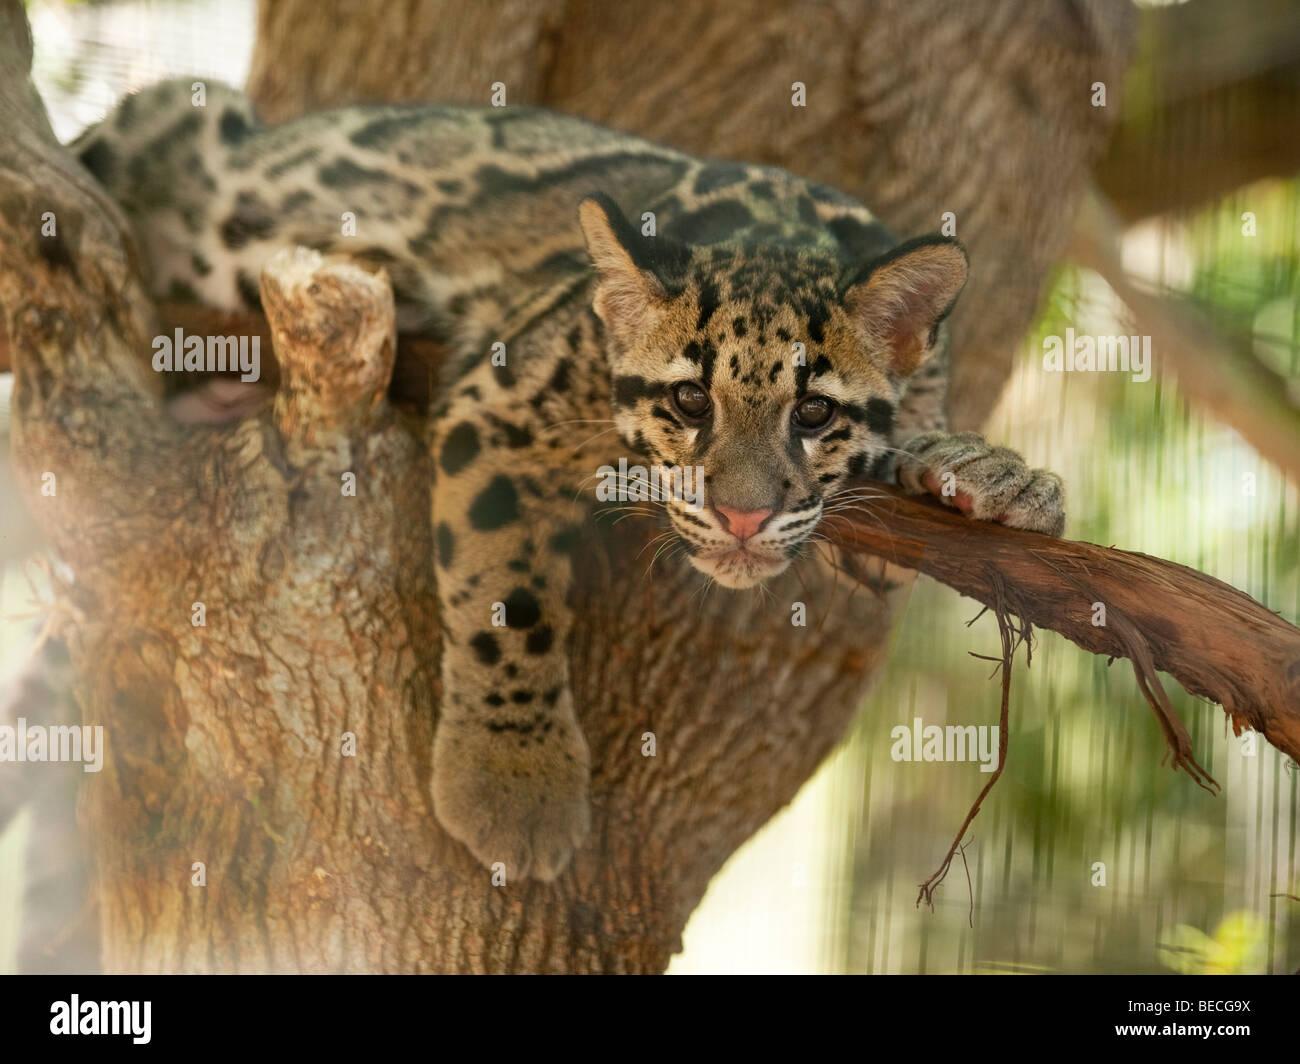 Pet clouded leopard